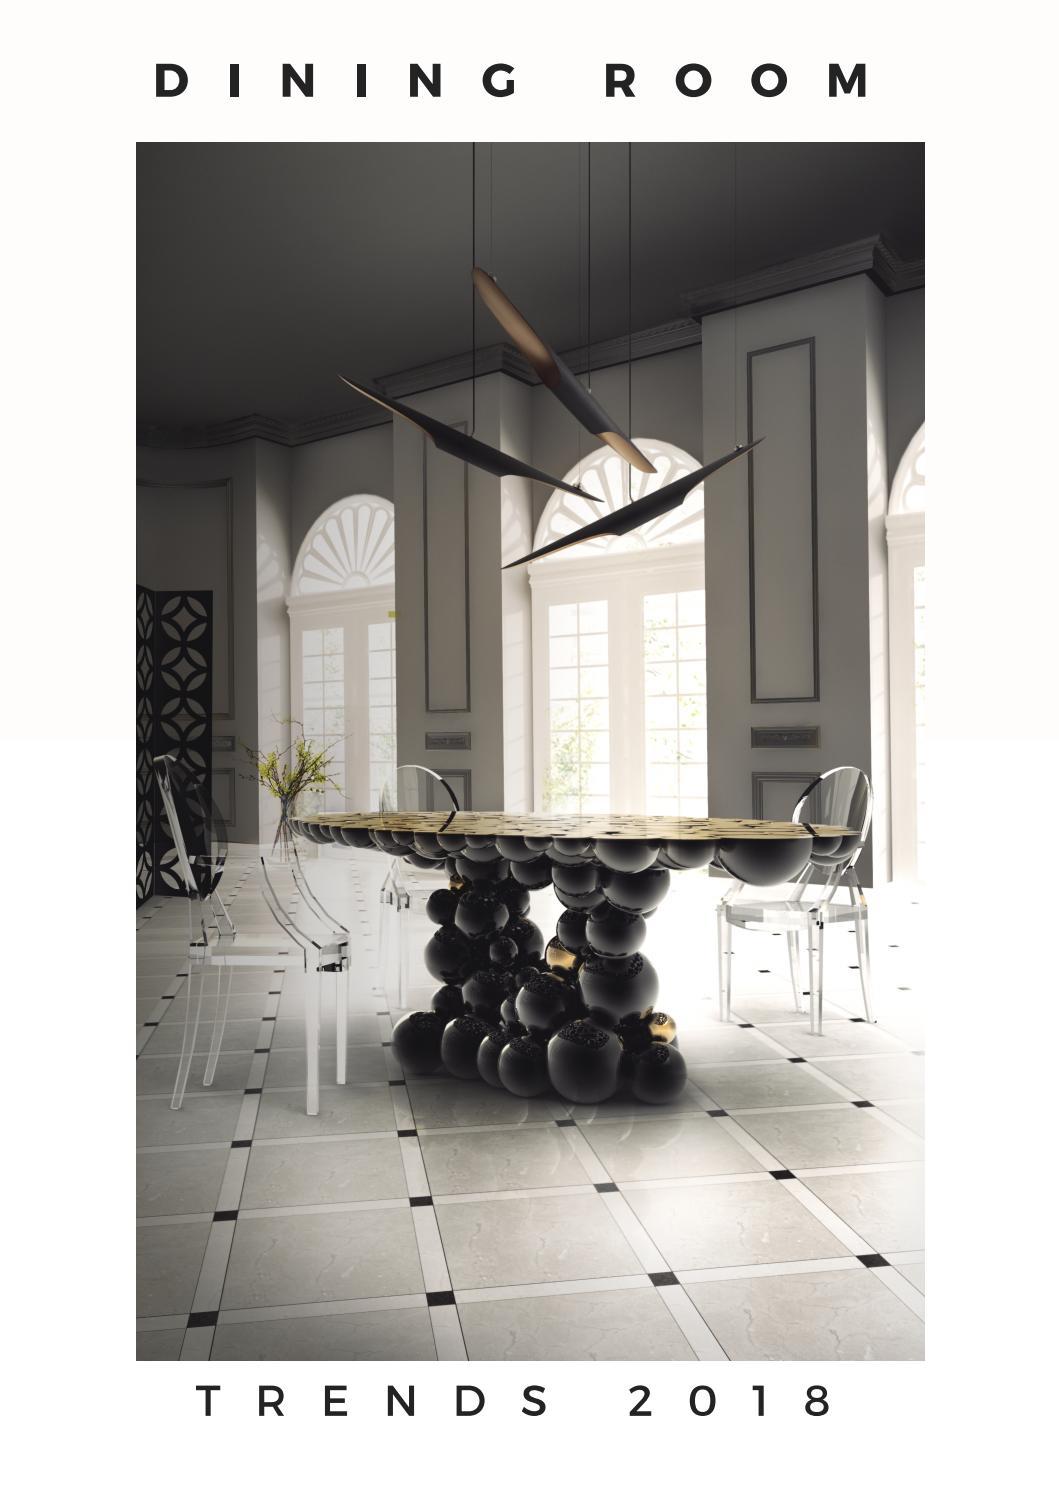 Dining room ideas interior design trends 2018 home living